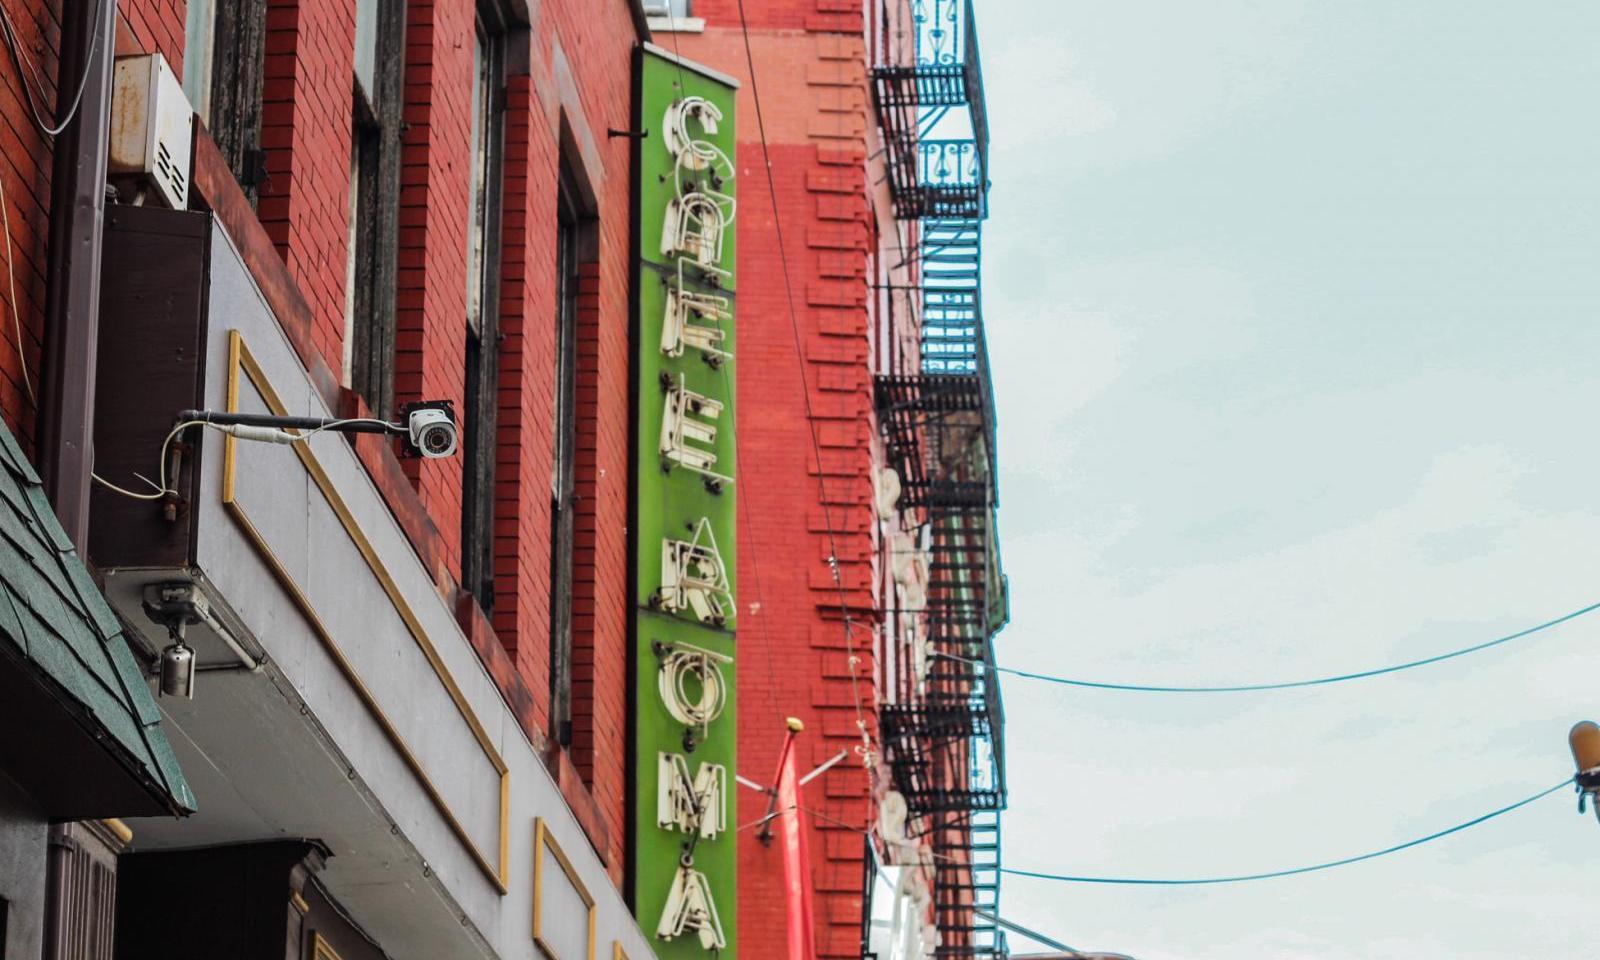 Little Italy in New York: unser Insider-Guide & die besten Spots 2018 •